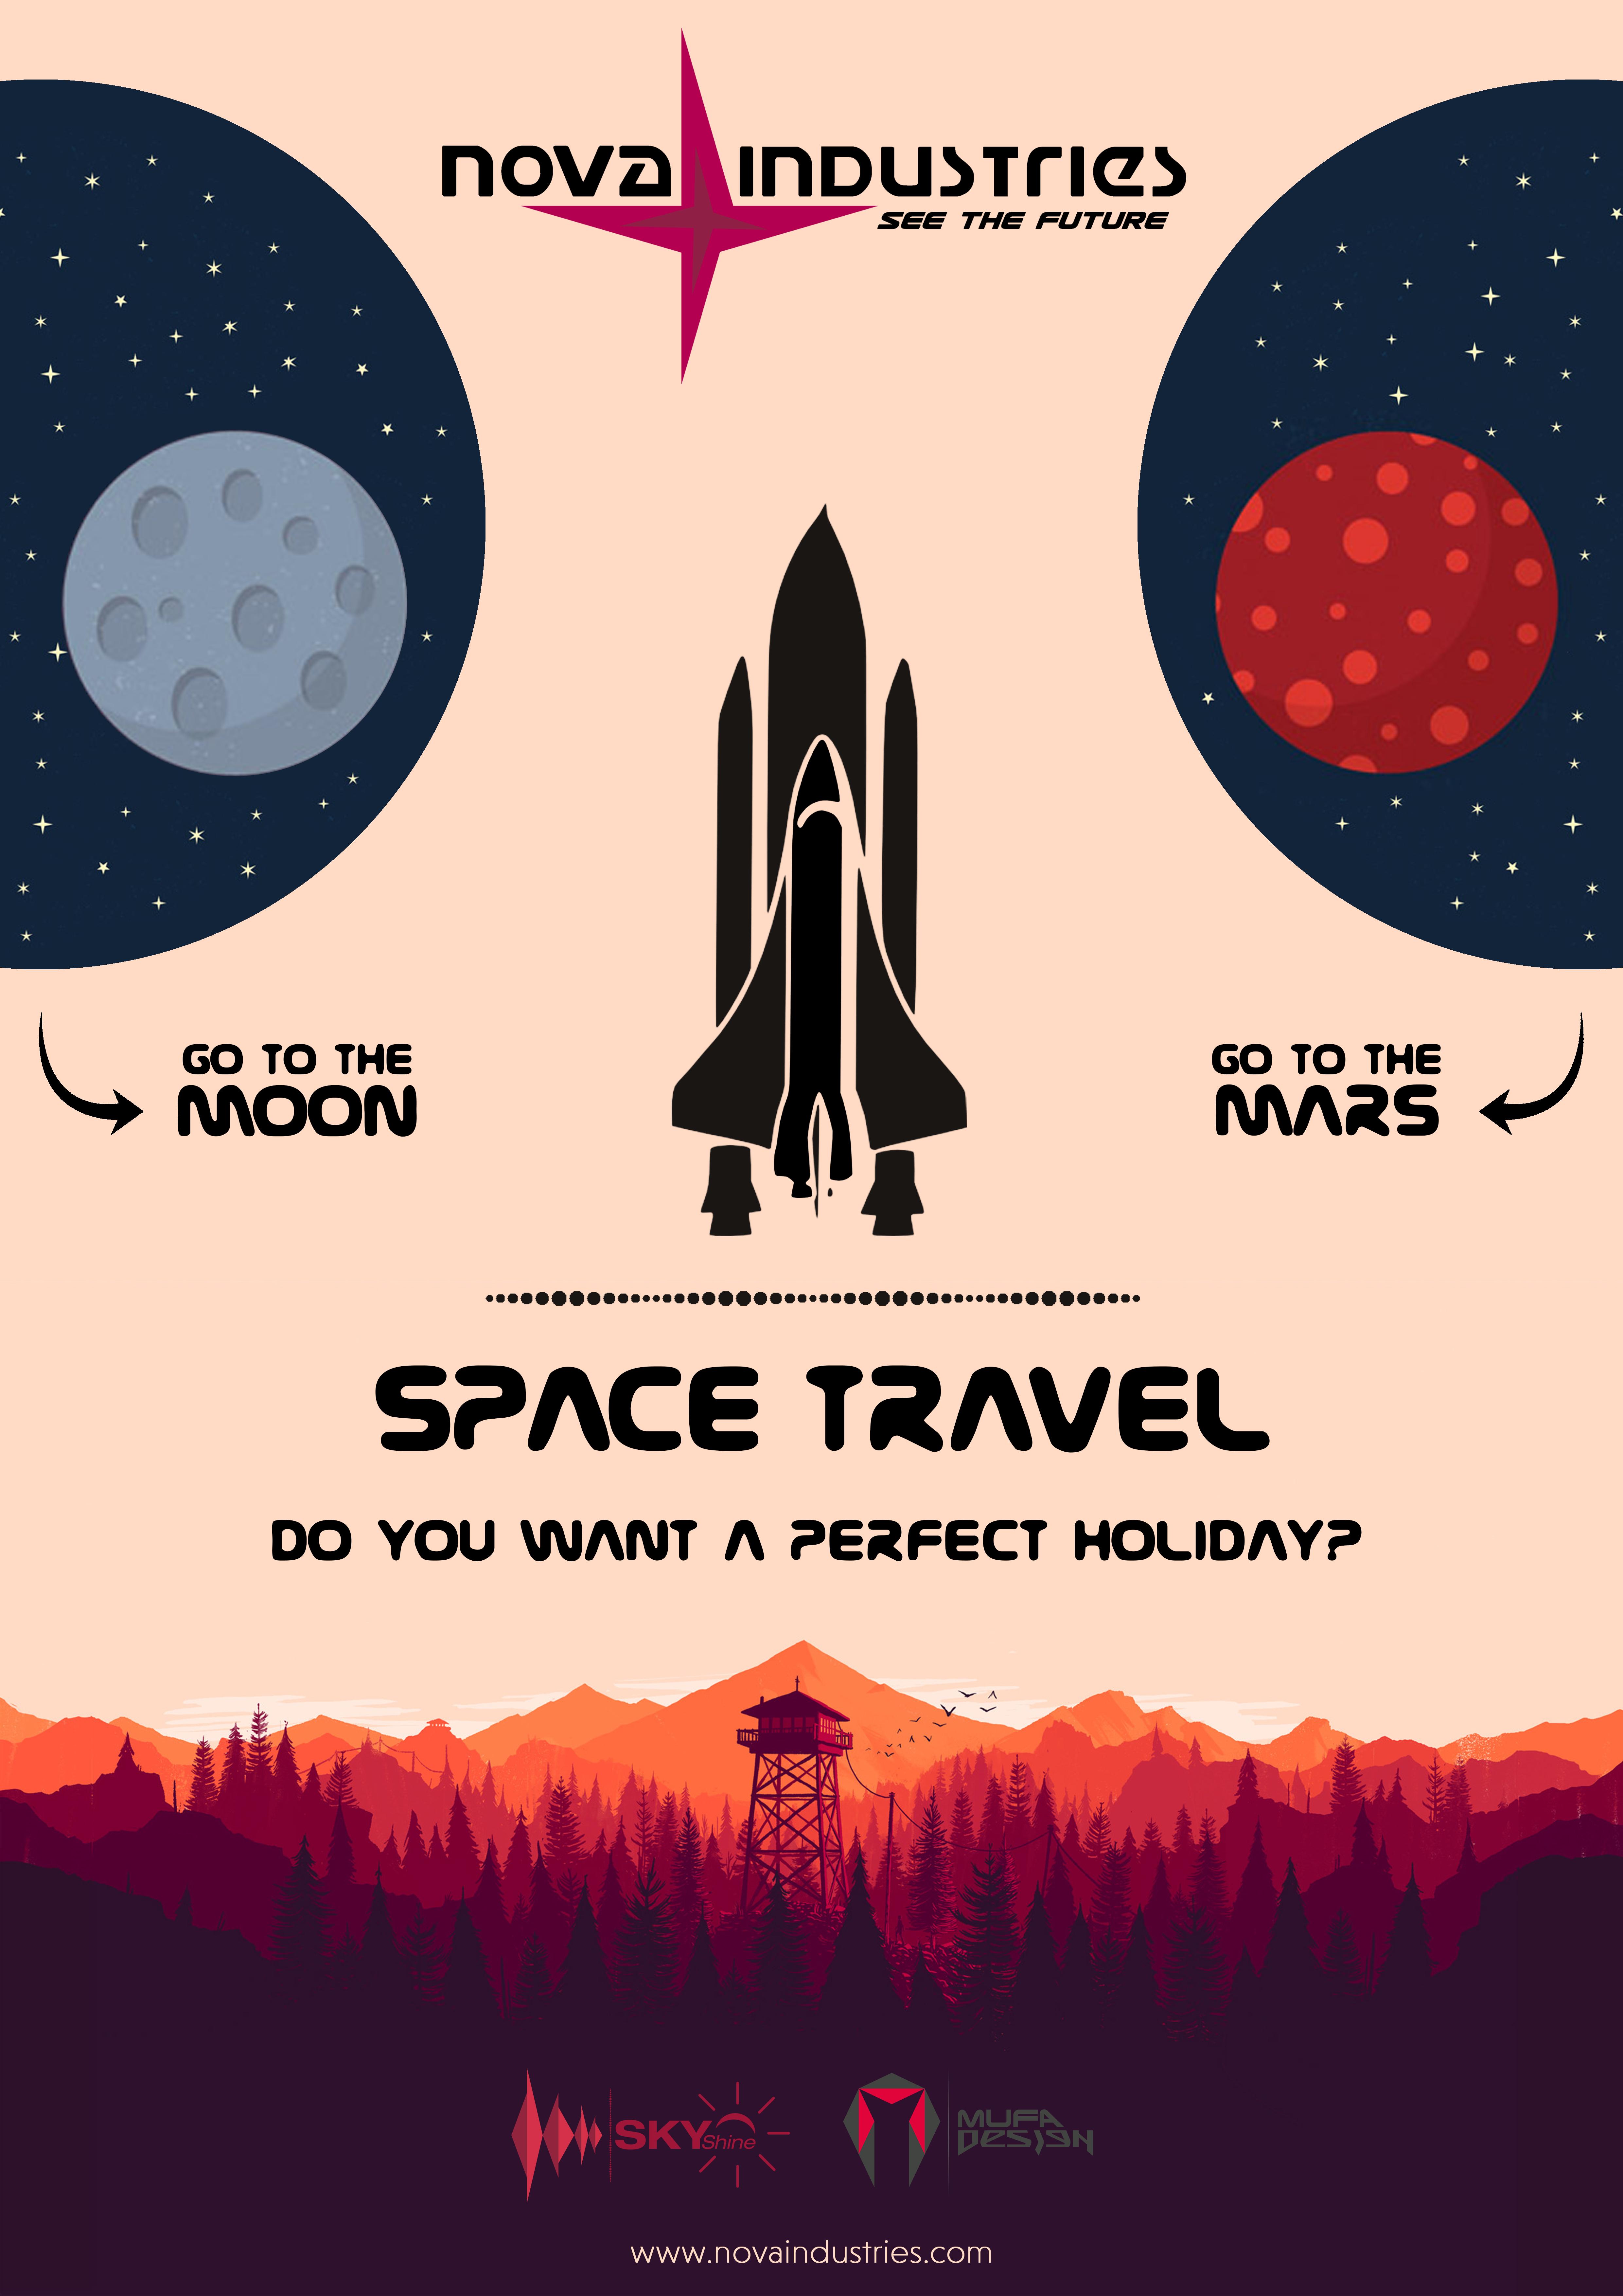 Poster design deviantart - Space Travel Poster Design By Darthmufa Space Travel Poster Design By Darthmufa